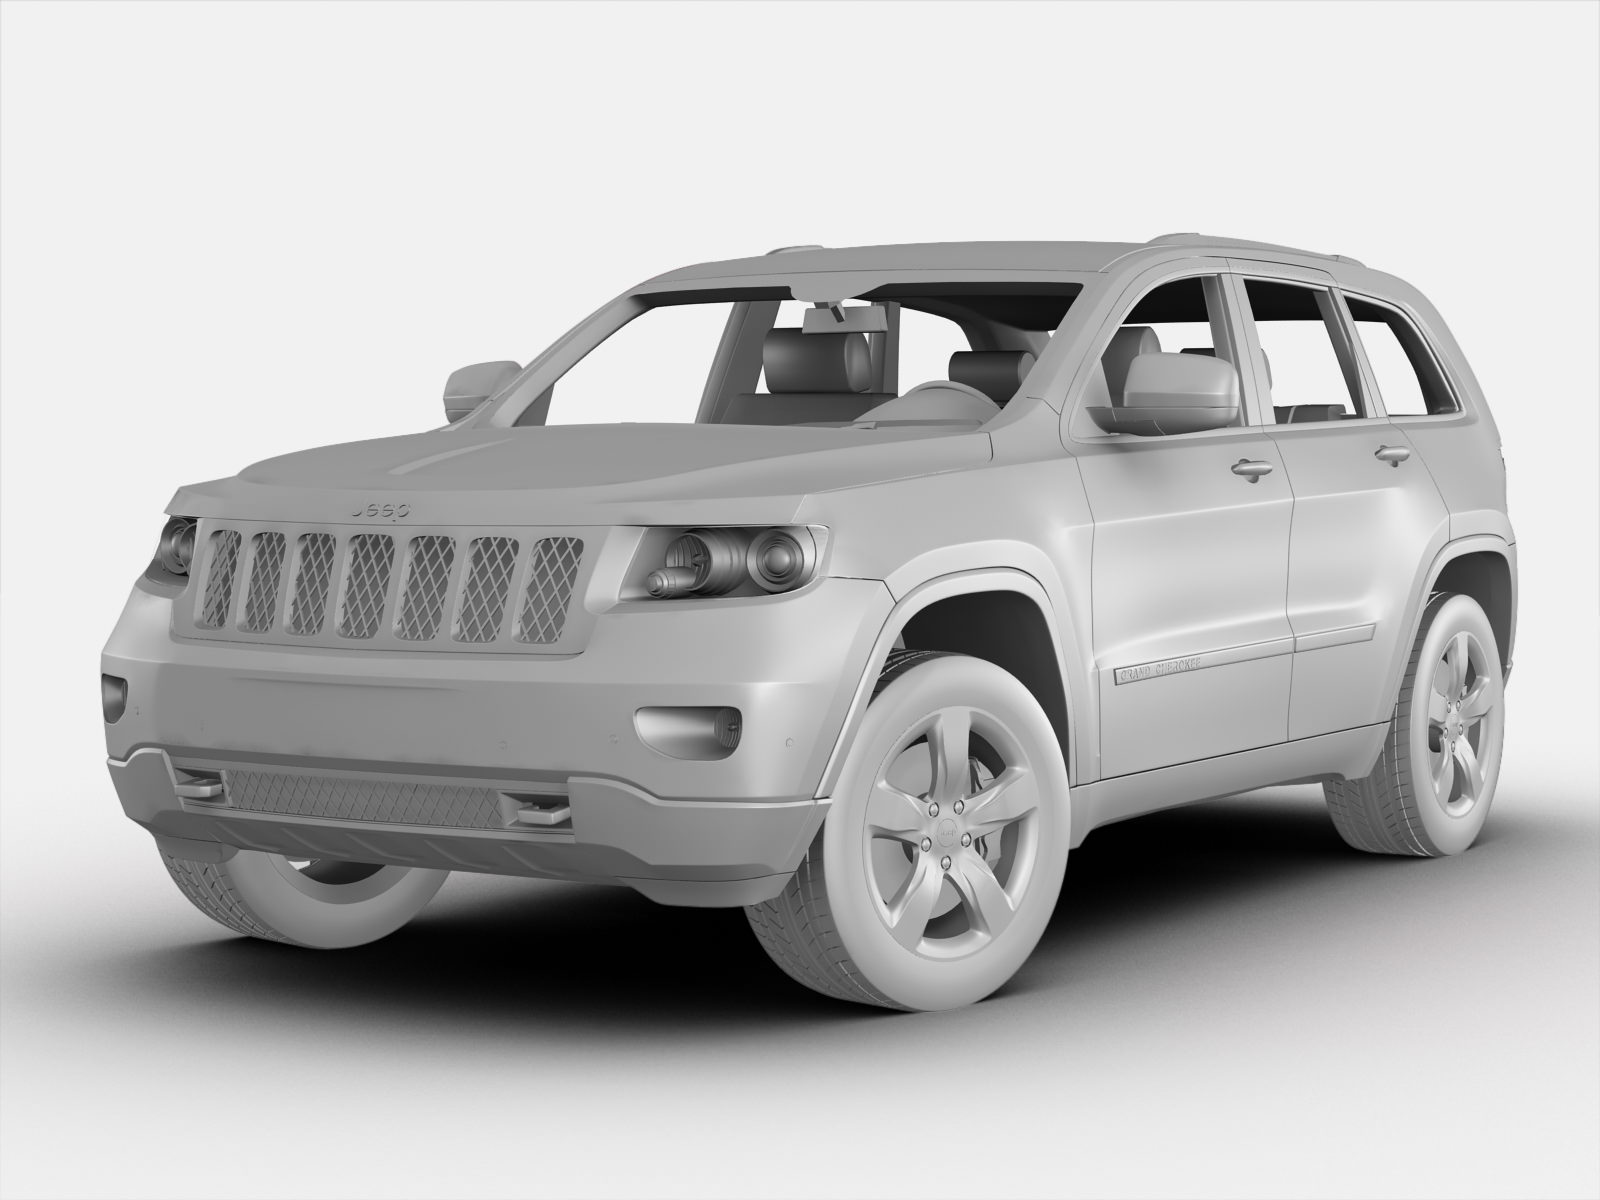 jeep grand cherokee 2012 3d model   cgtrader